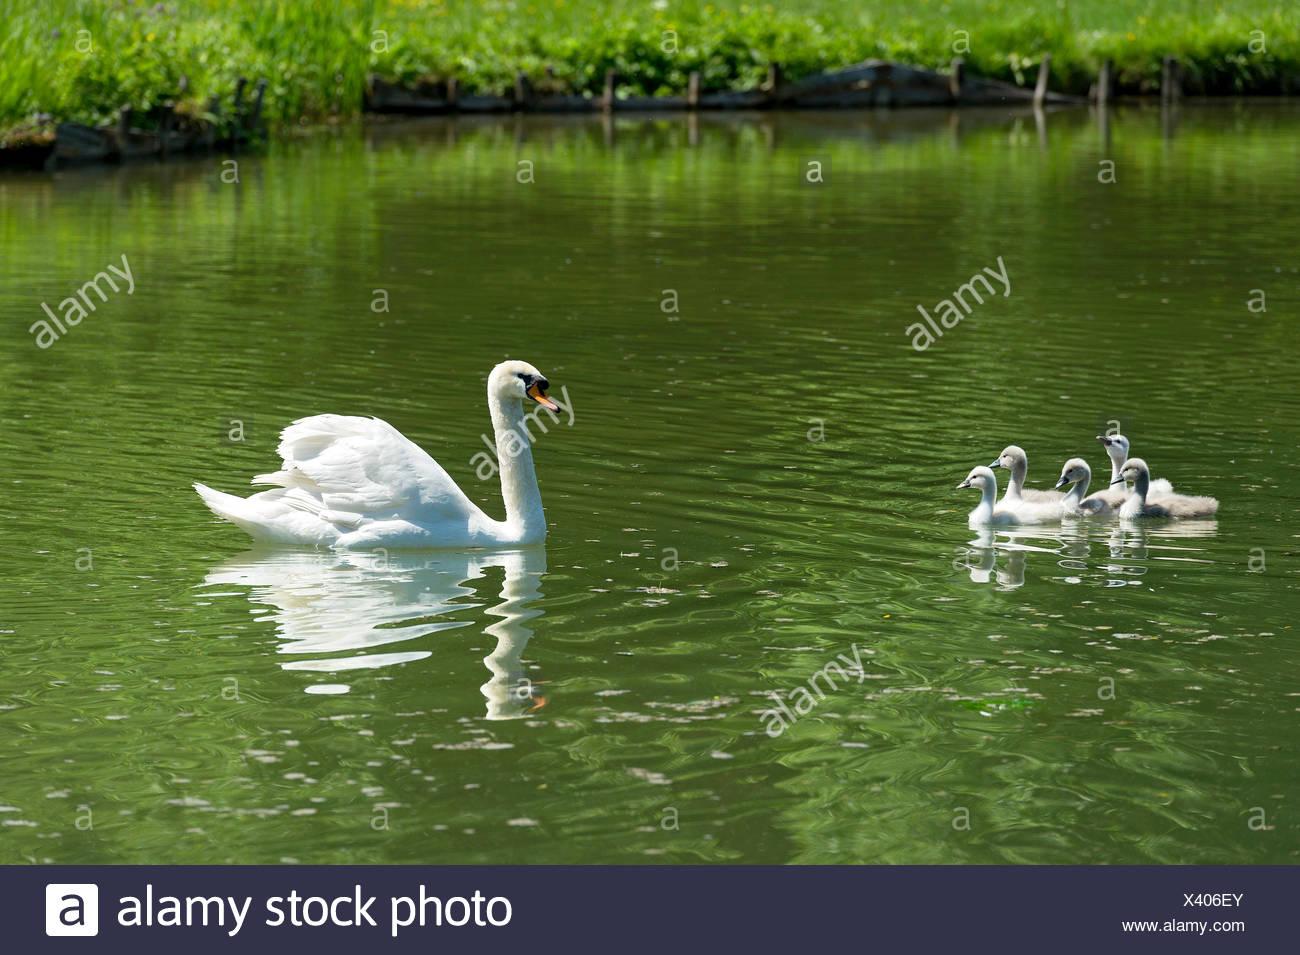 Mute Swan (Cygnus olor) with young birds, Central Canal, Schleissheim Palace complex, Oberschleißheim, Upper Bavaria, Bavaria - Stock Image